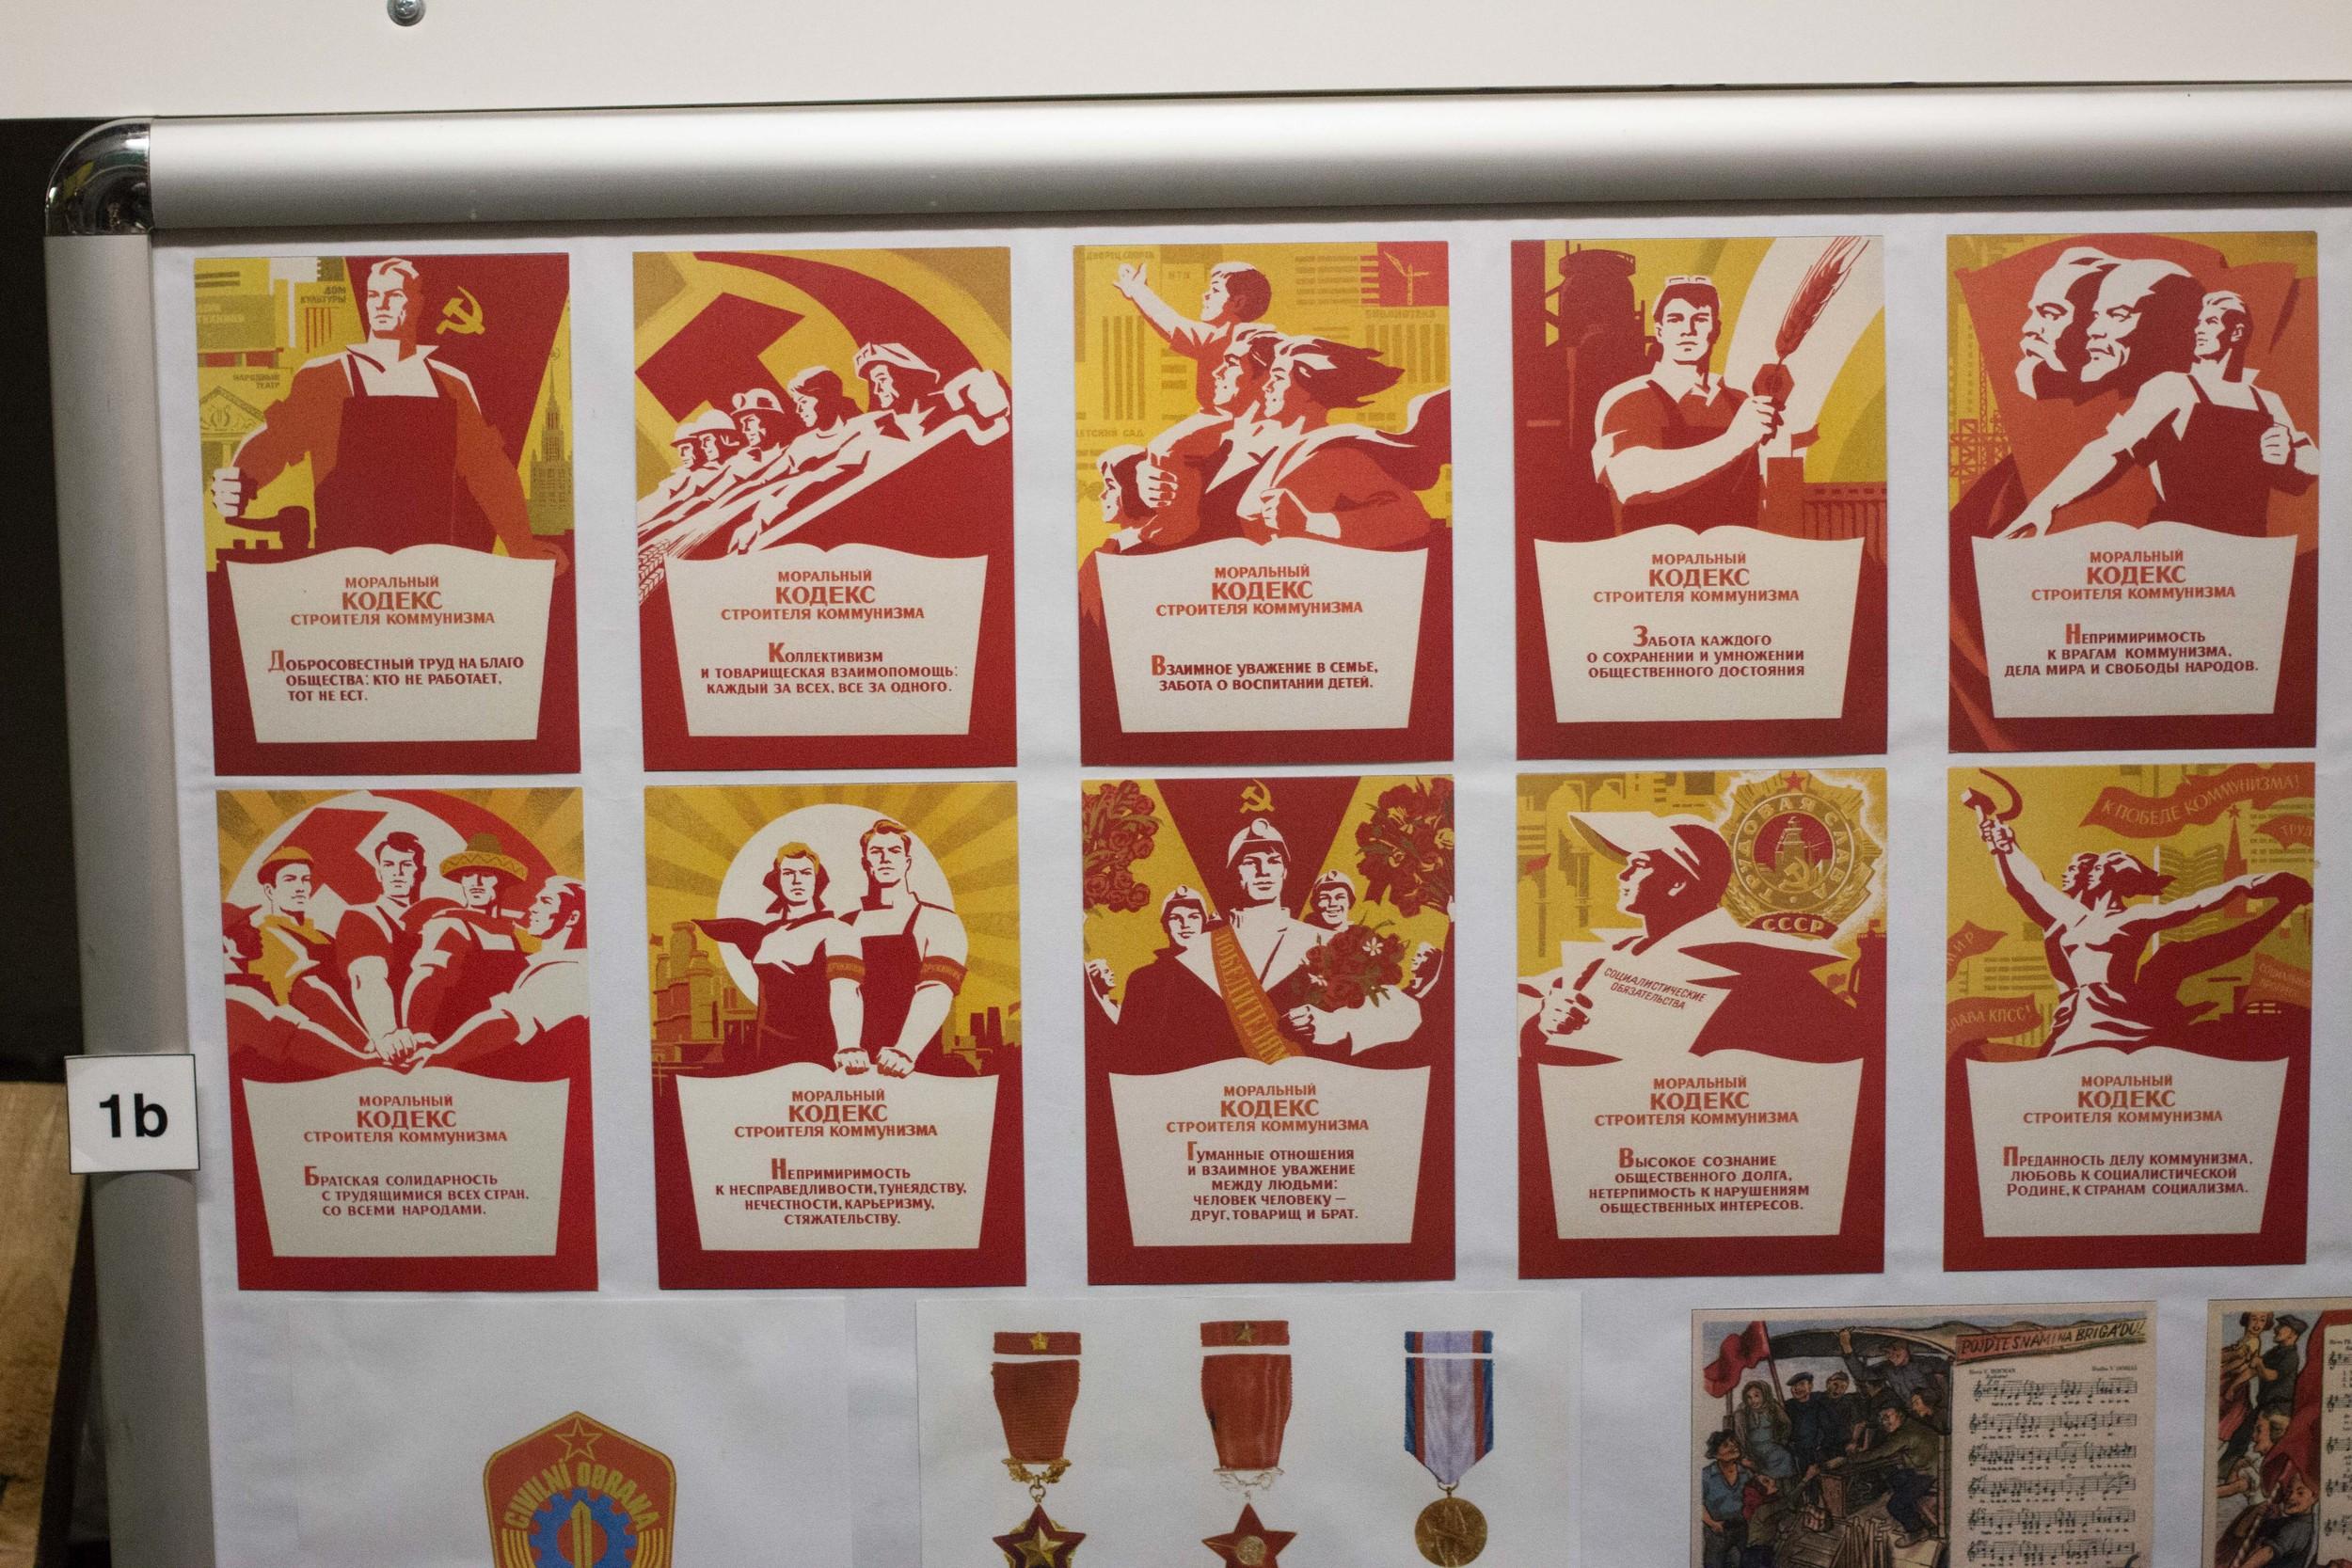 Display of Propaganda used during the Communist era